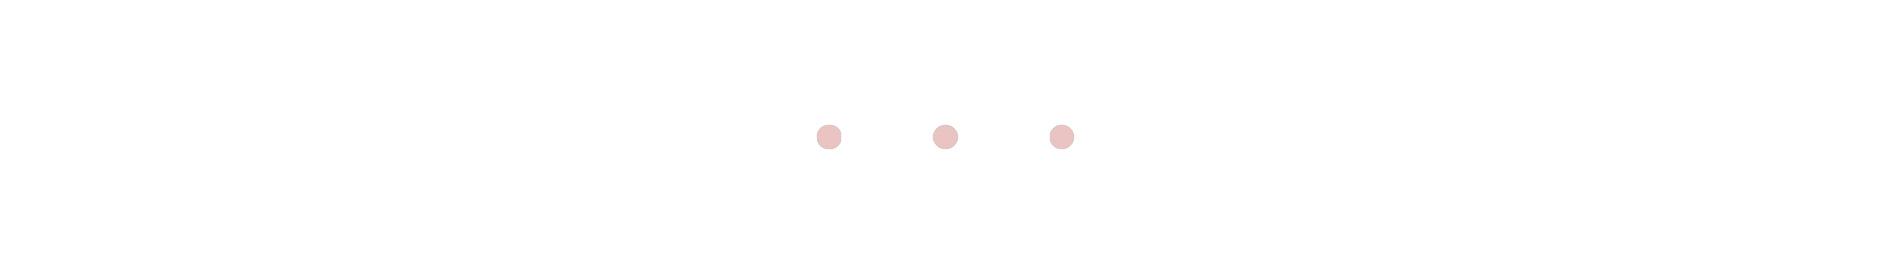 pink dots.jpg